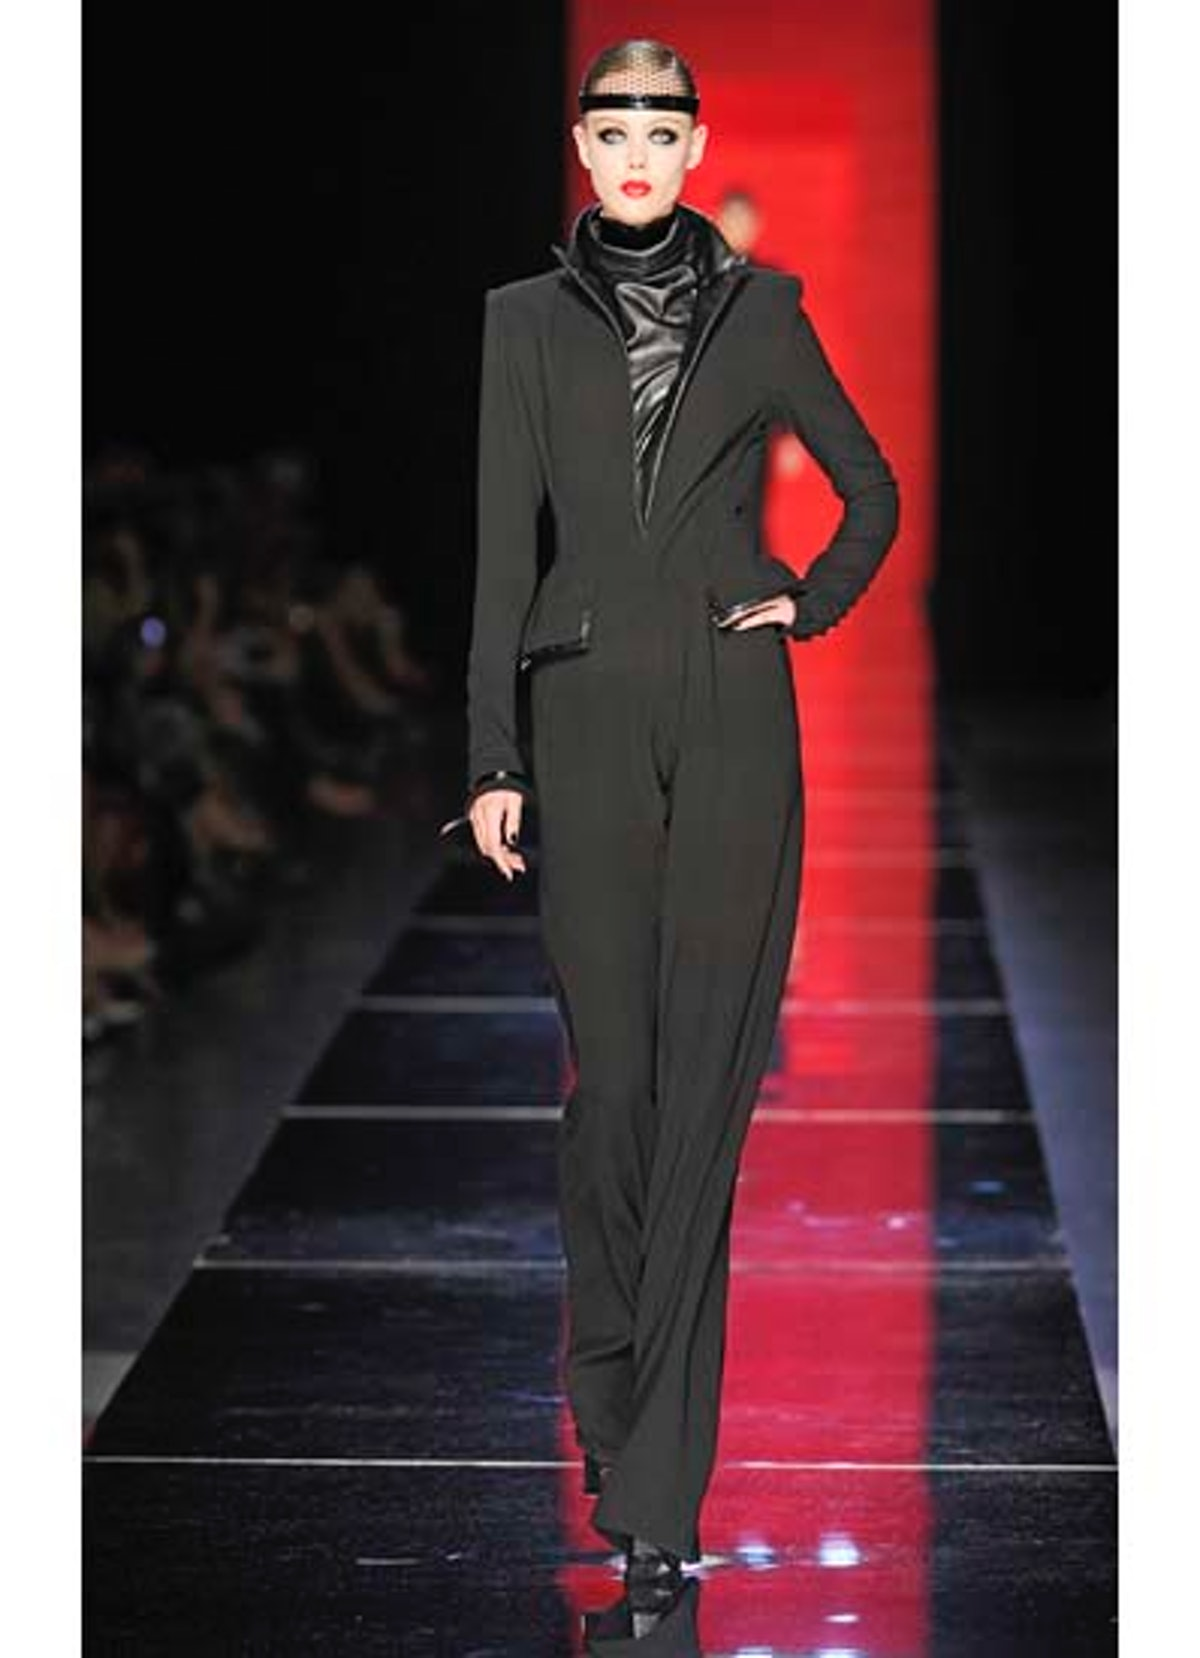 fass-jean-paul-gaultier-couture-2012-runway-02-v.jpg